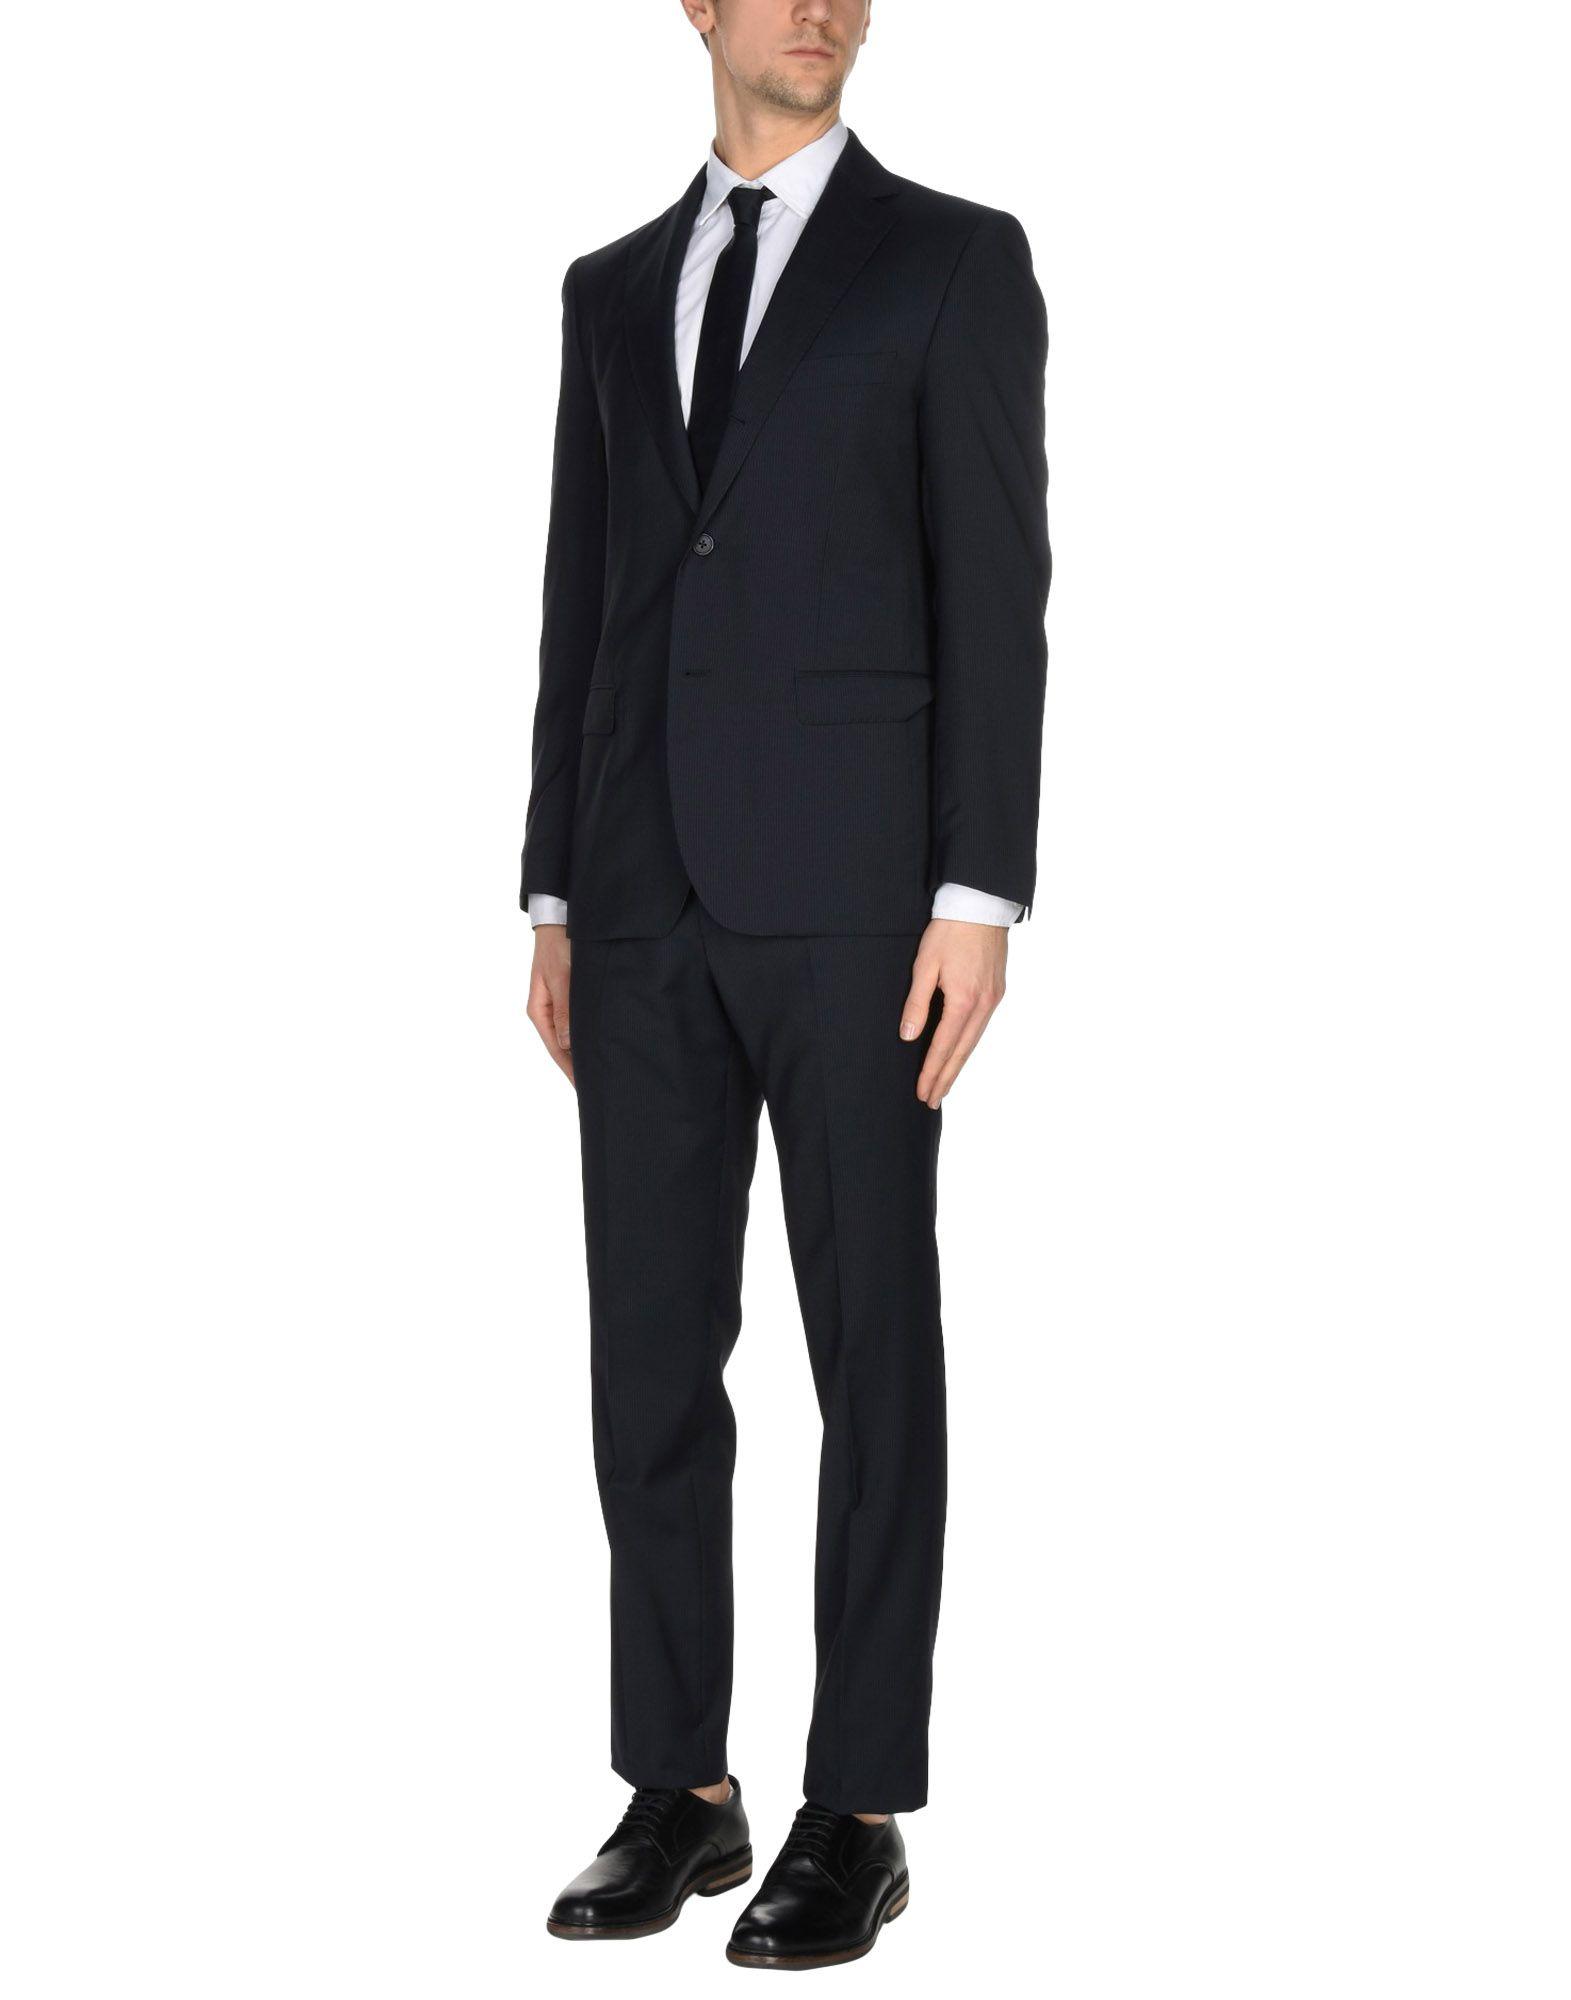 MONTEZEMOLO Suits in Black